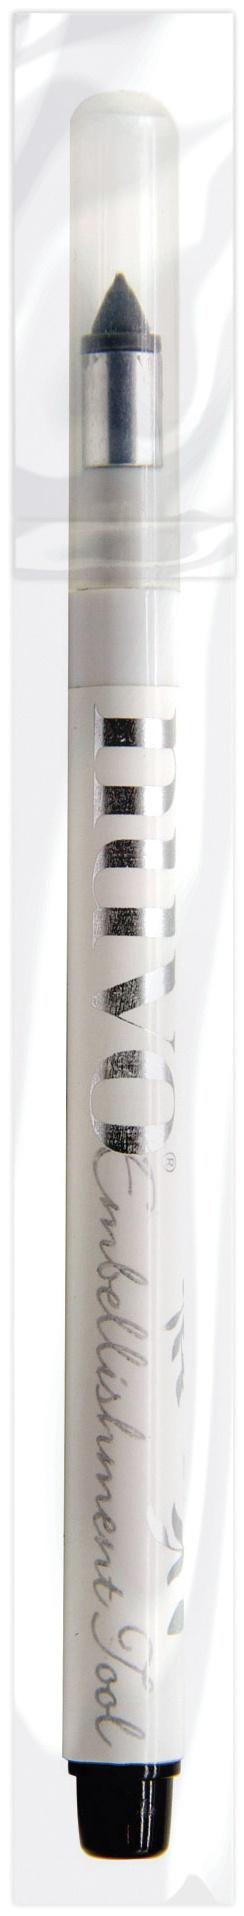 New! Nuvo Embellishment Tool-